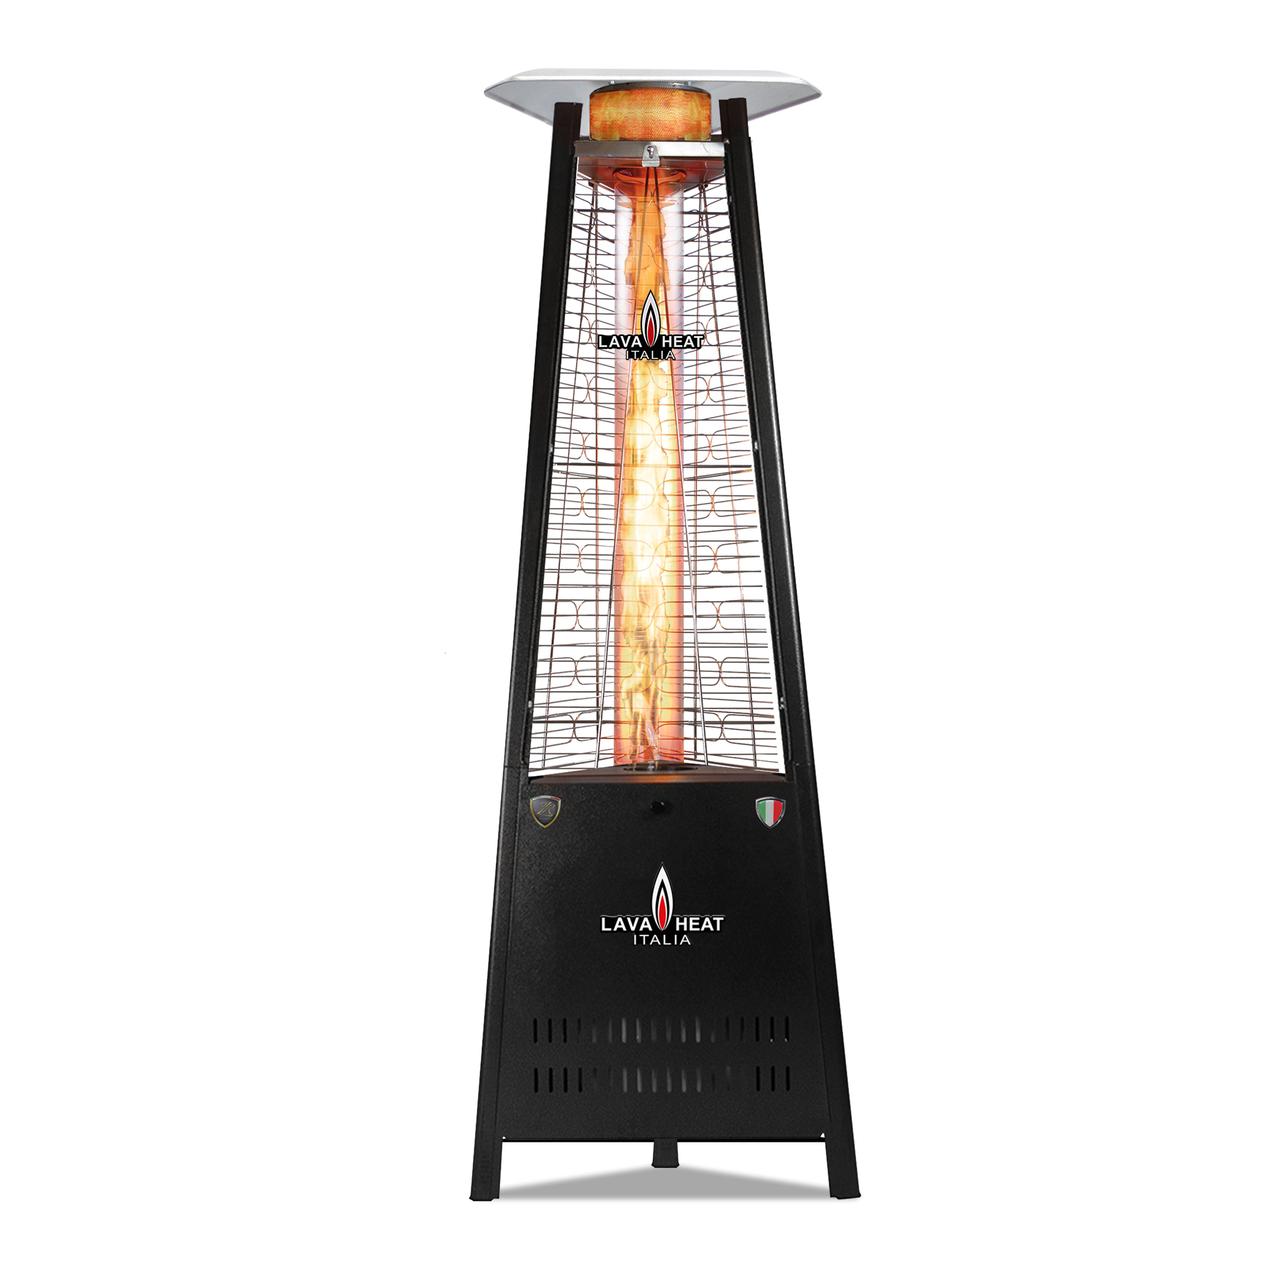 Lava Heat LP Capri Triangle Flame Tower Heater - Hammered Black